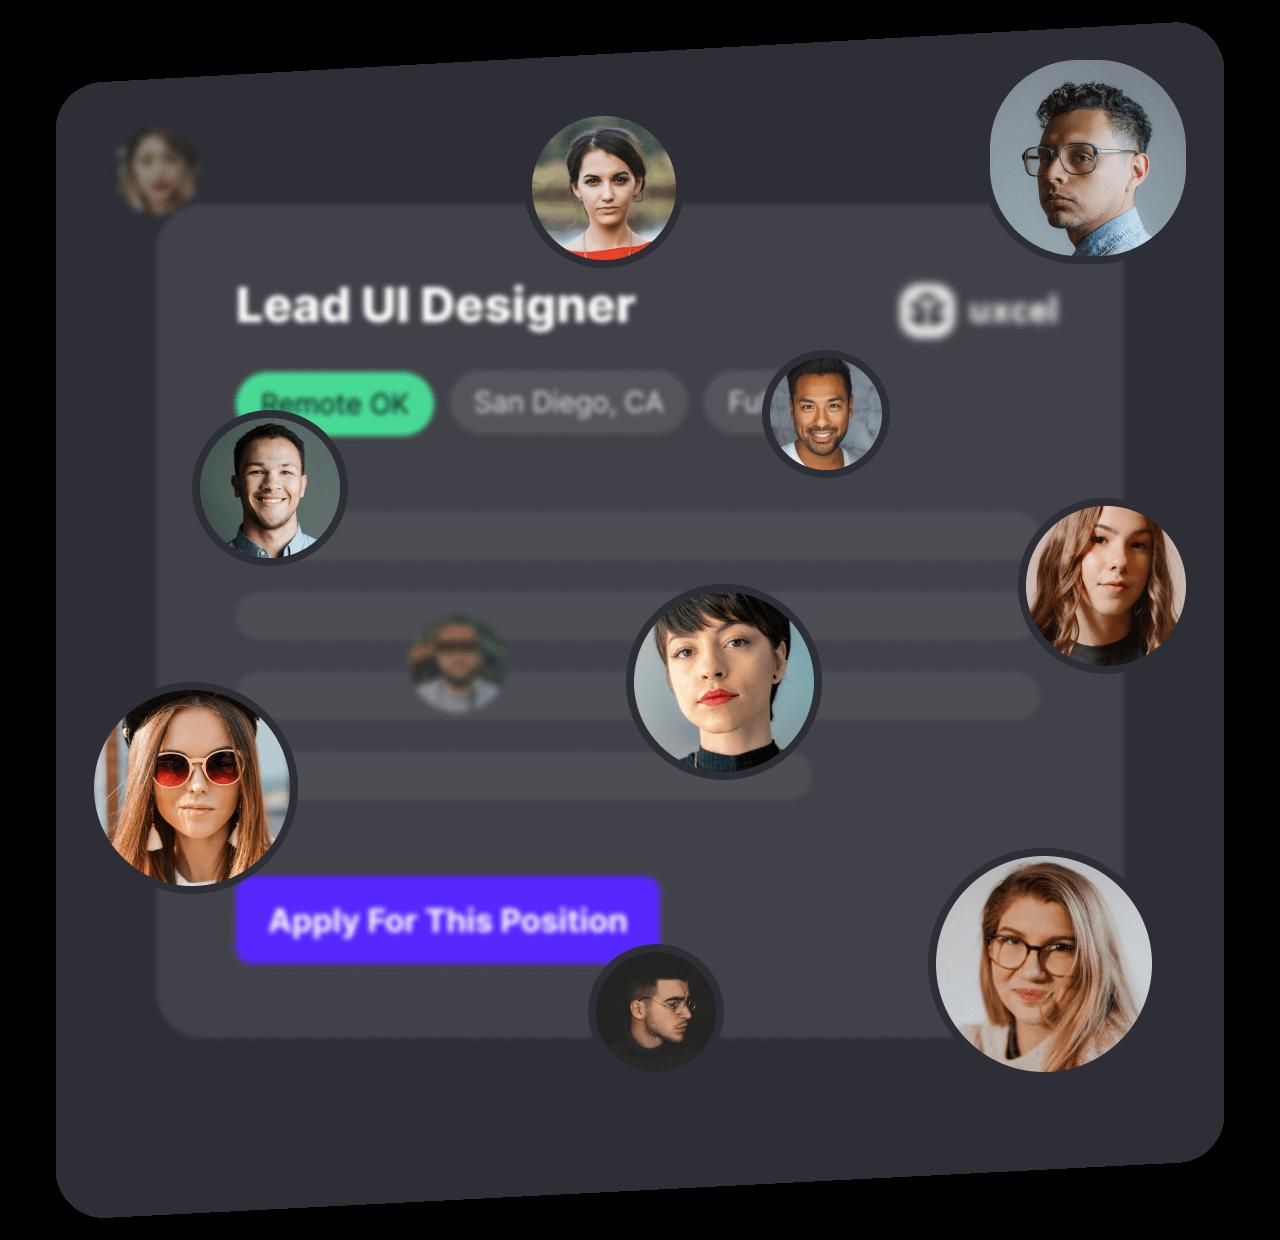 40k+ designers